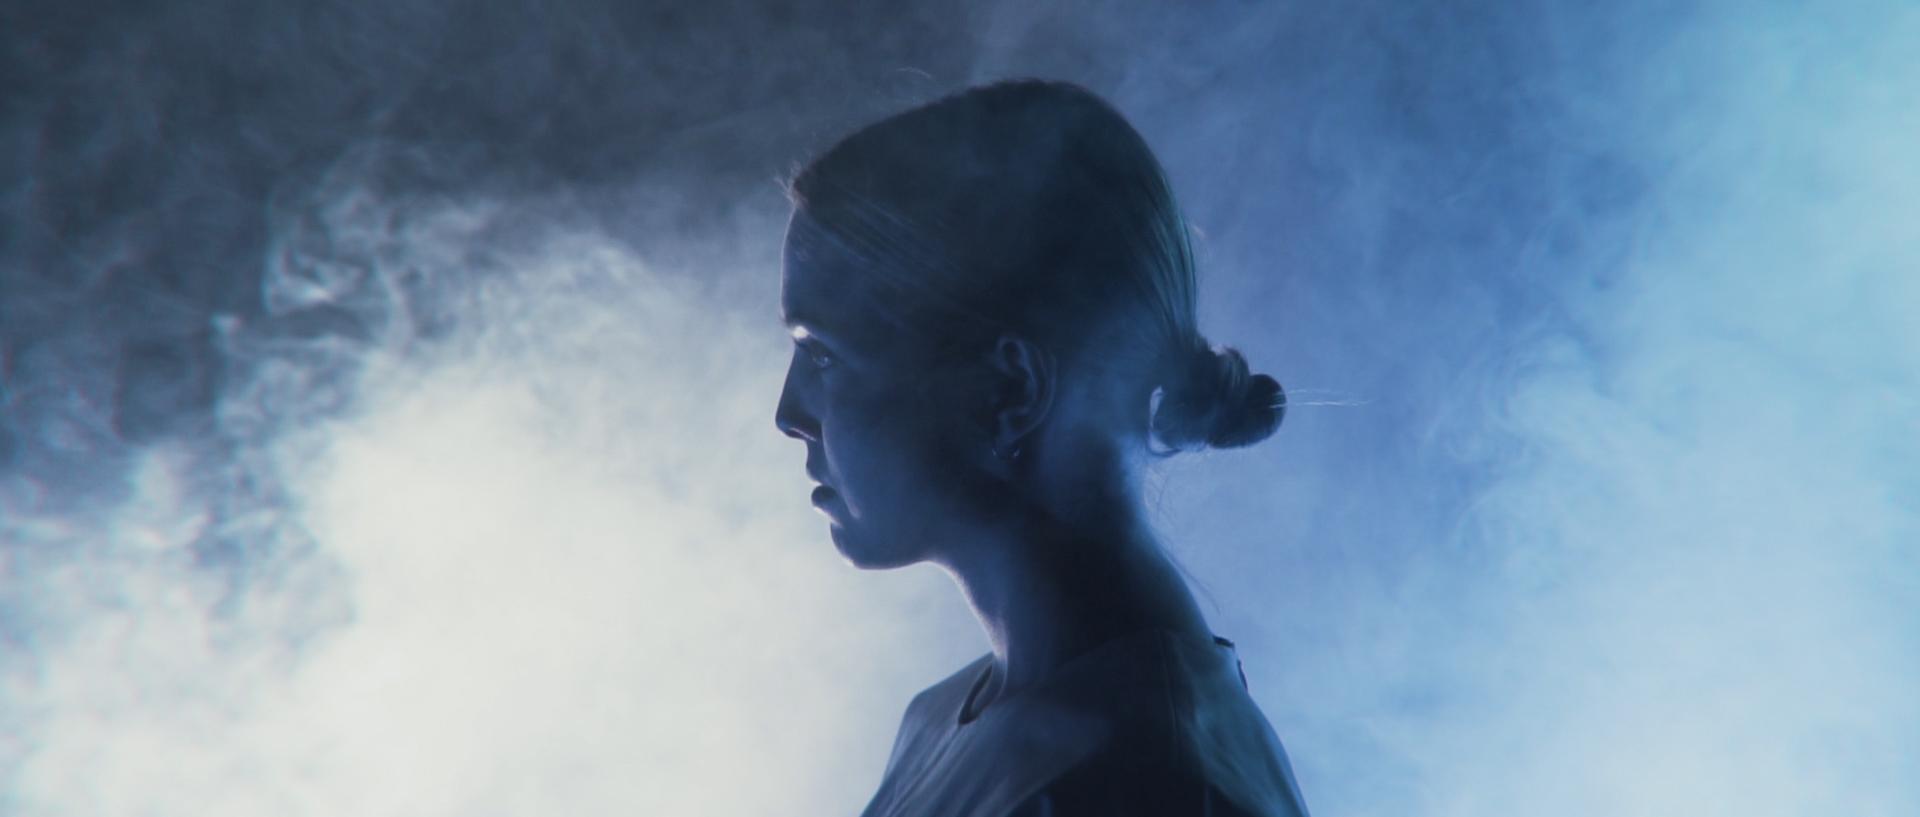 Girl standing in smoke